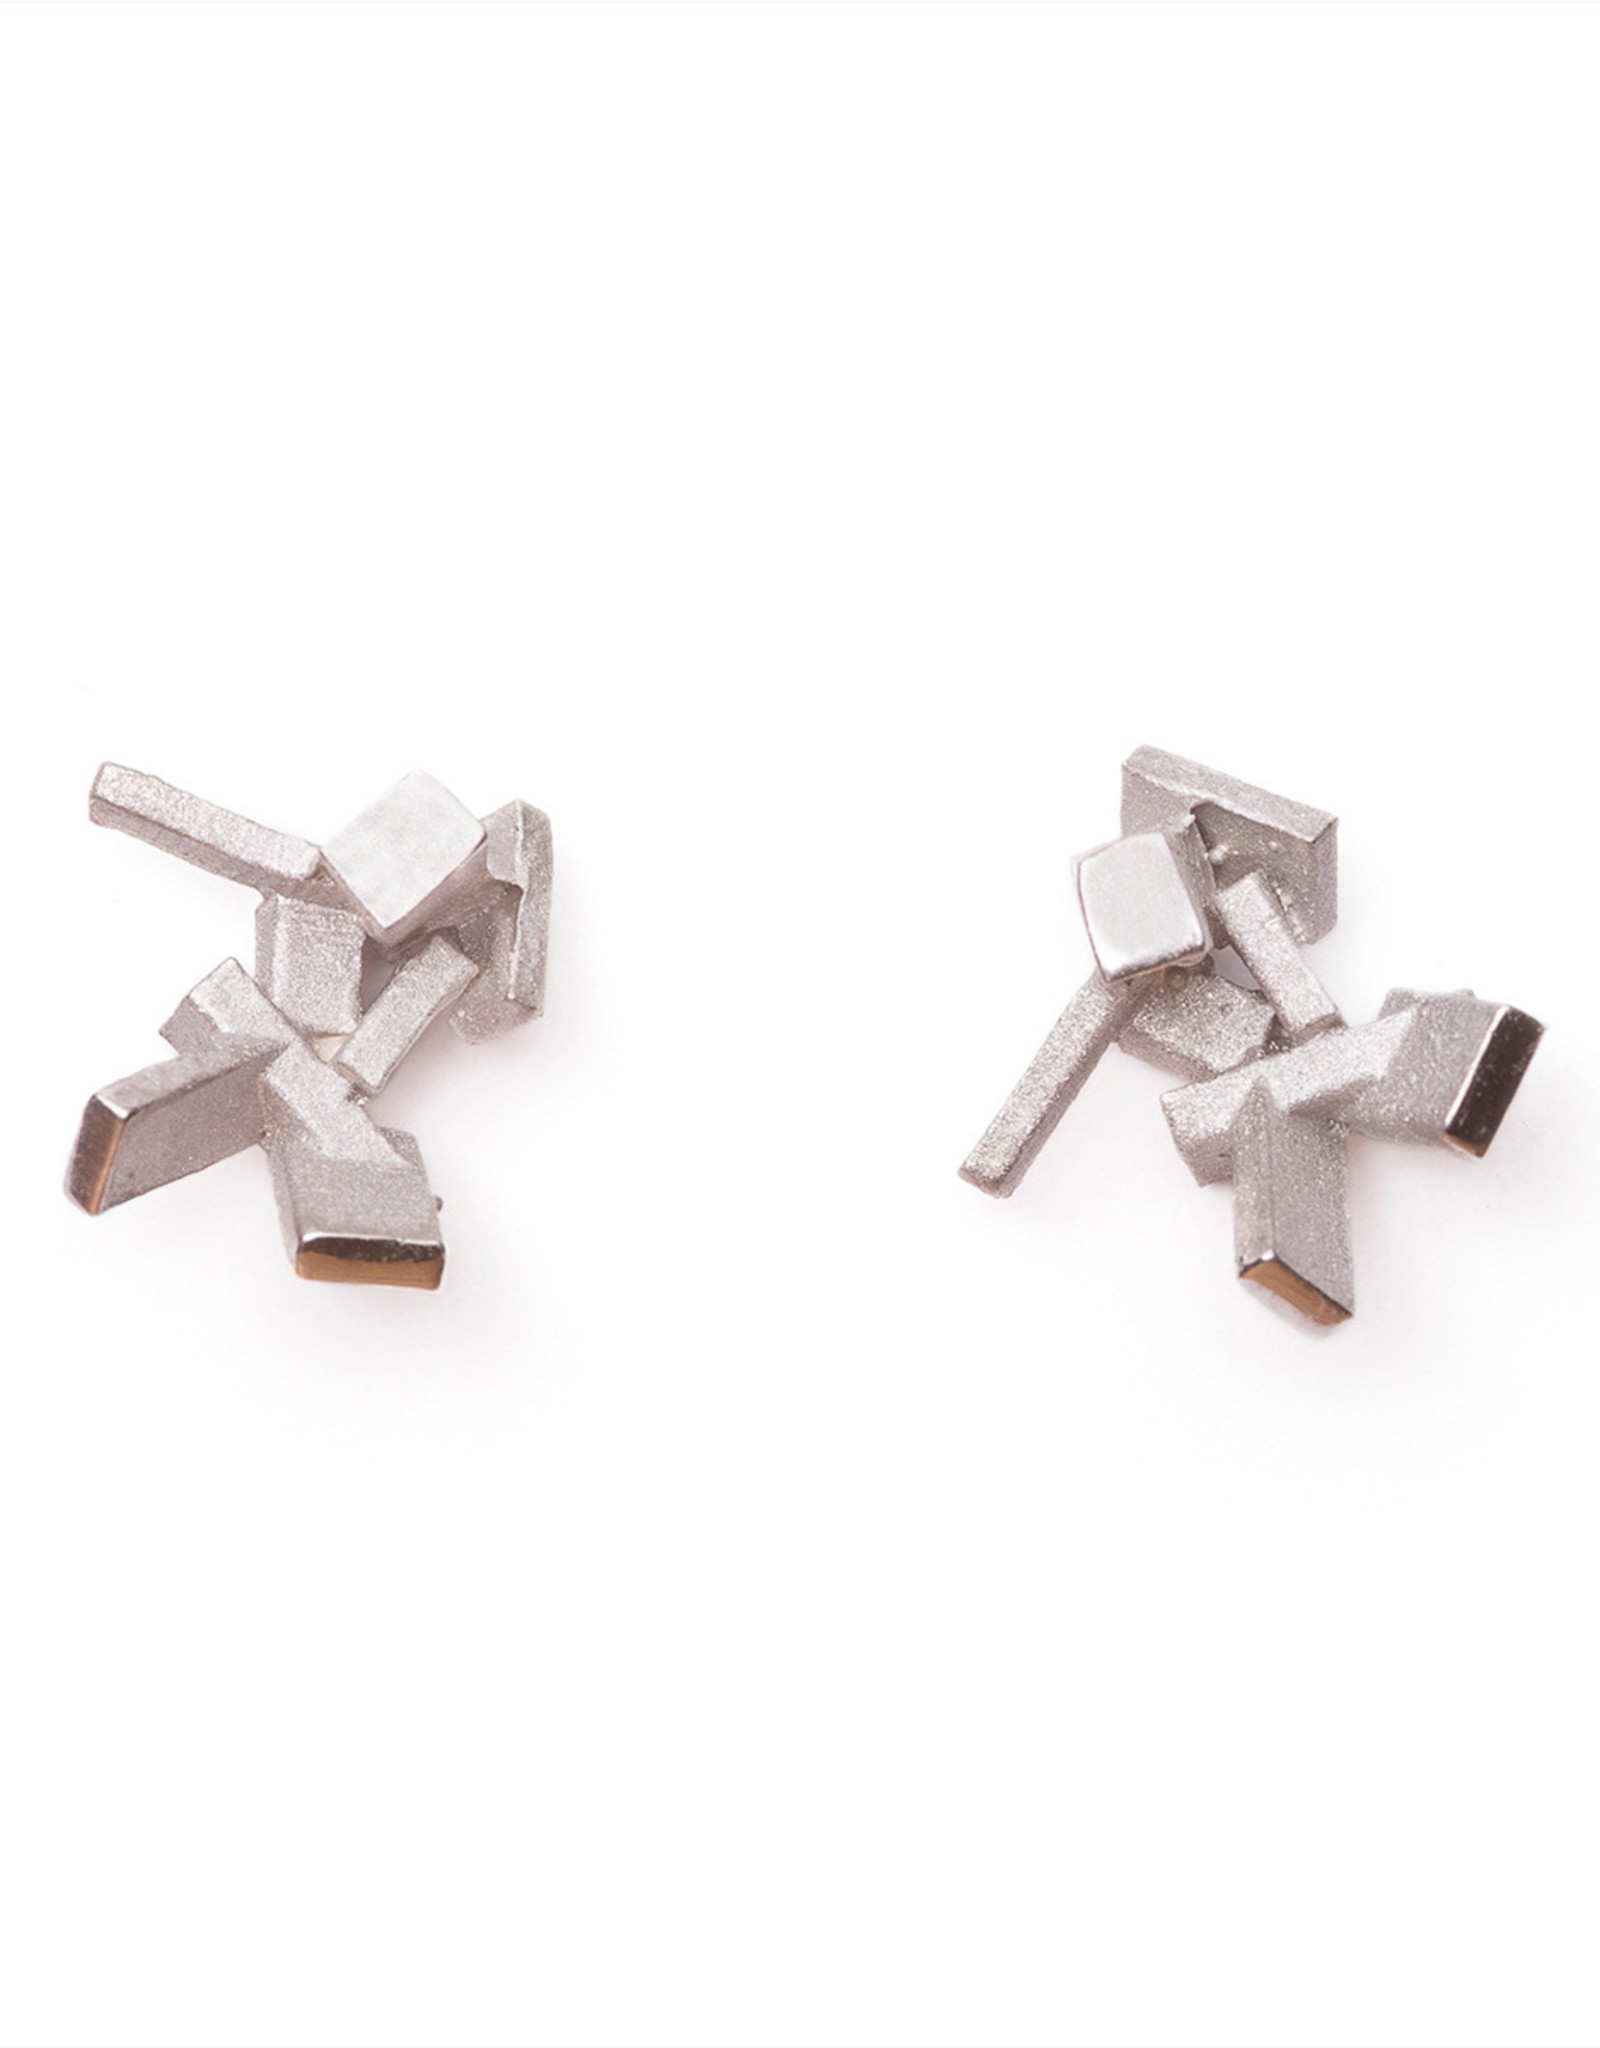 Post earrings cubes